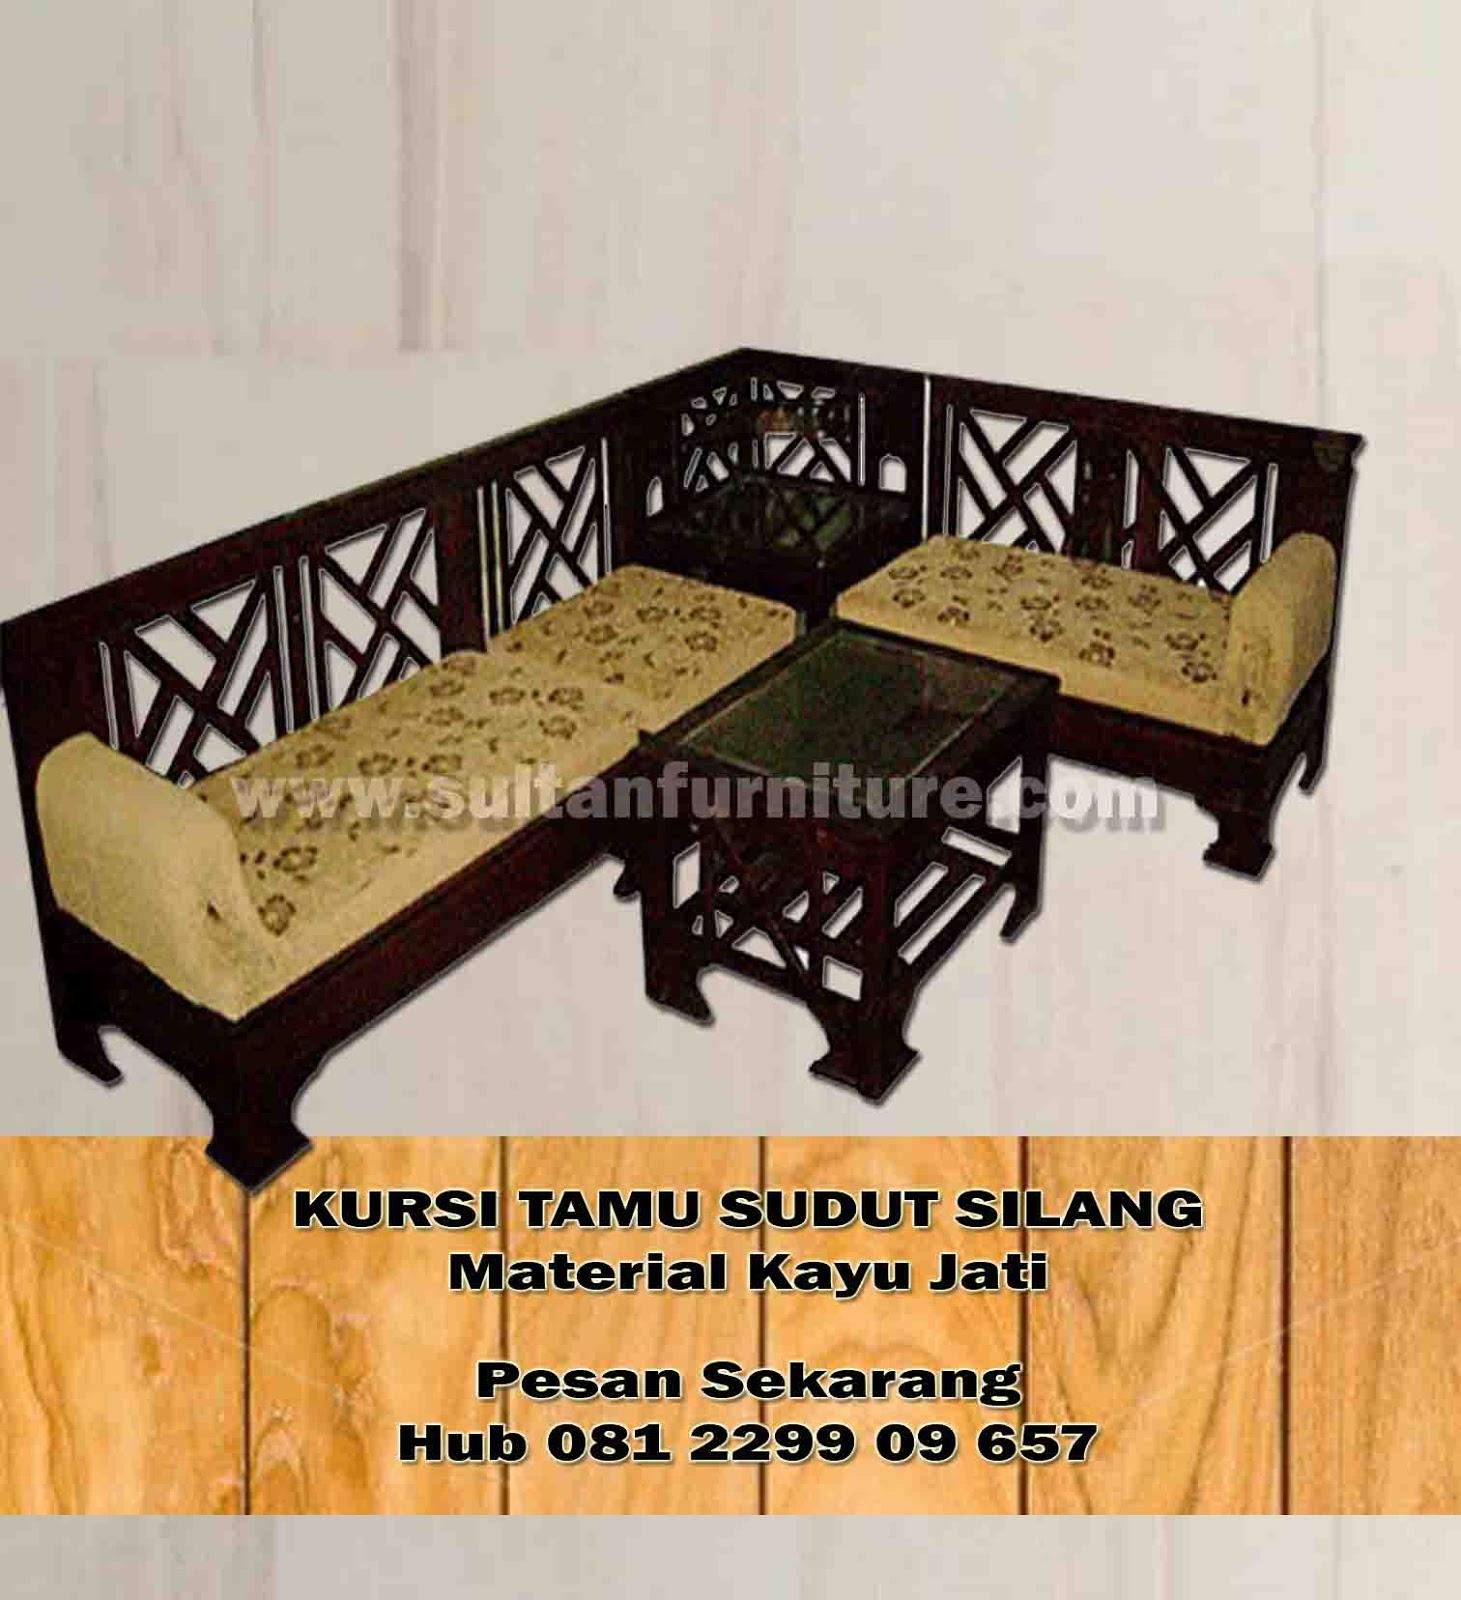 Sultan Furniture Indonesia Jual Furniture Jati Jepara